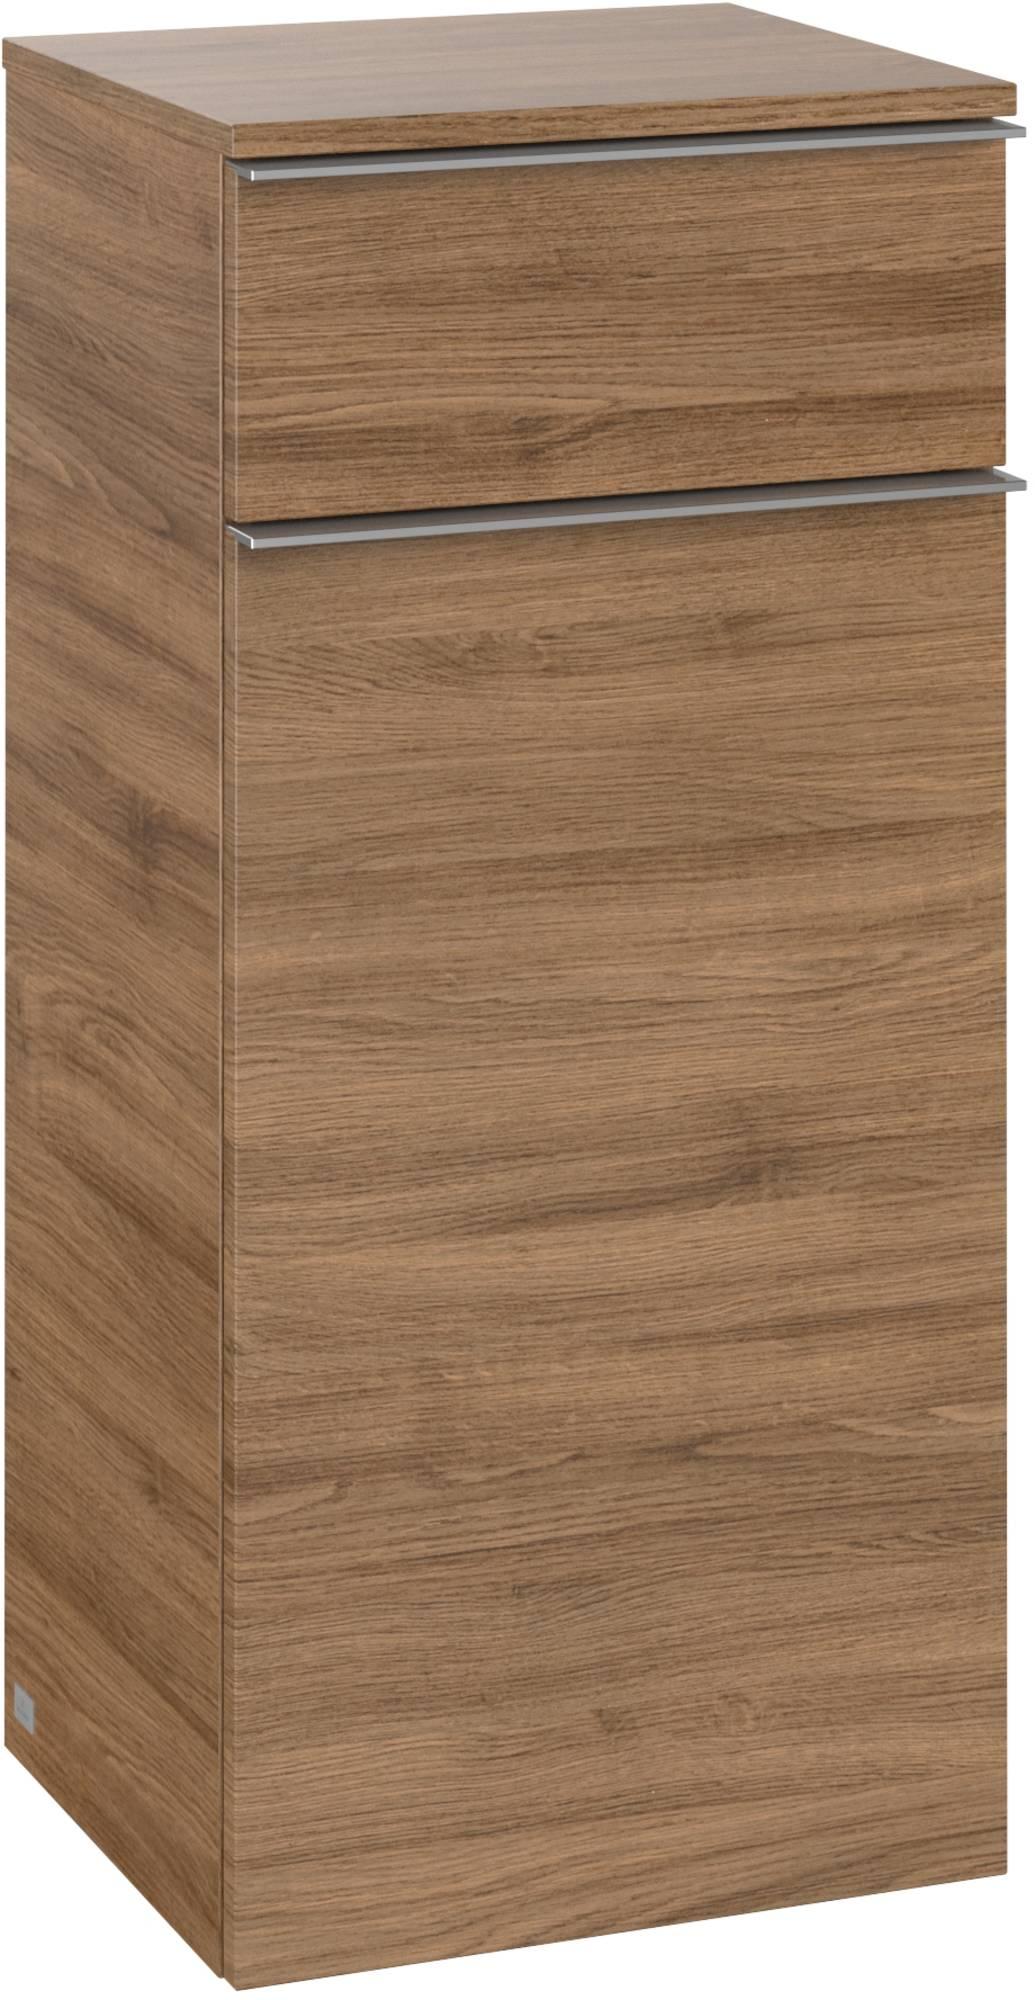 Villeroy & Boch Venticello Zijkast 40,4x37,2x86,6 cm Oak Kansas